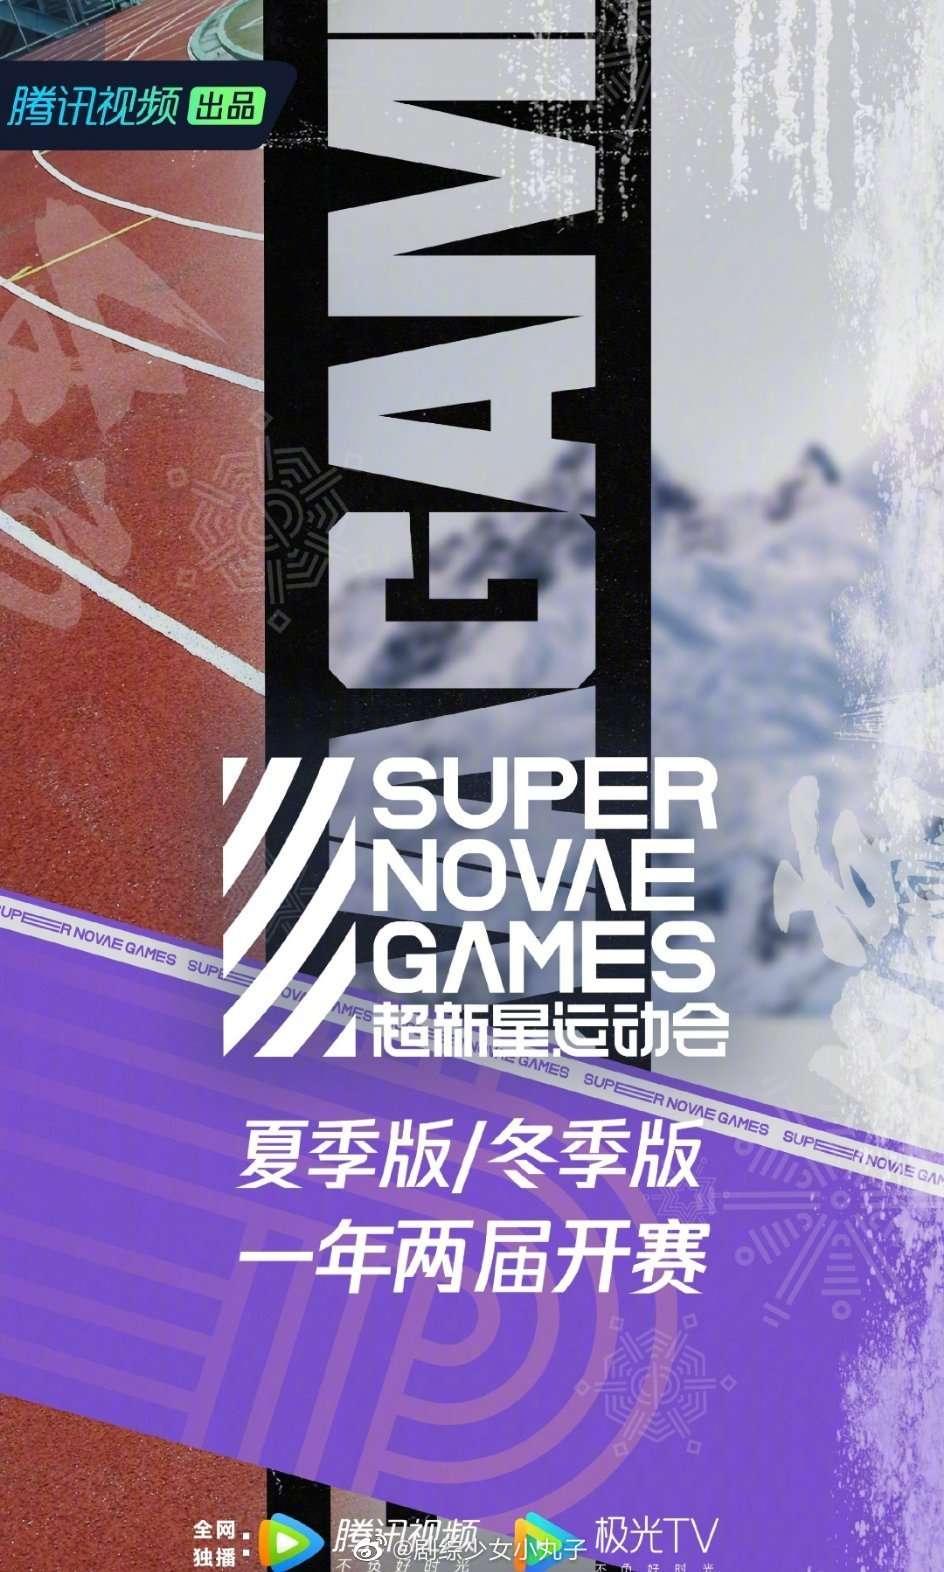 super nova games 2021 winter season